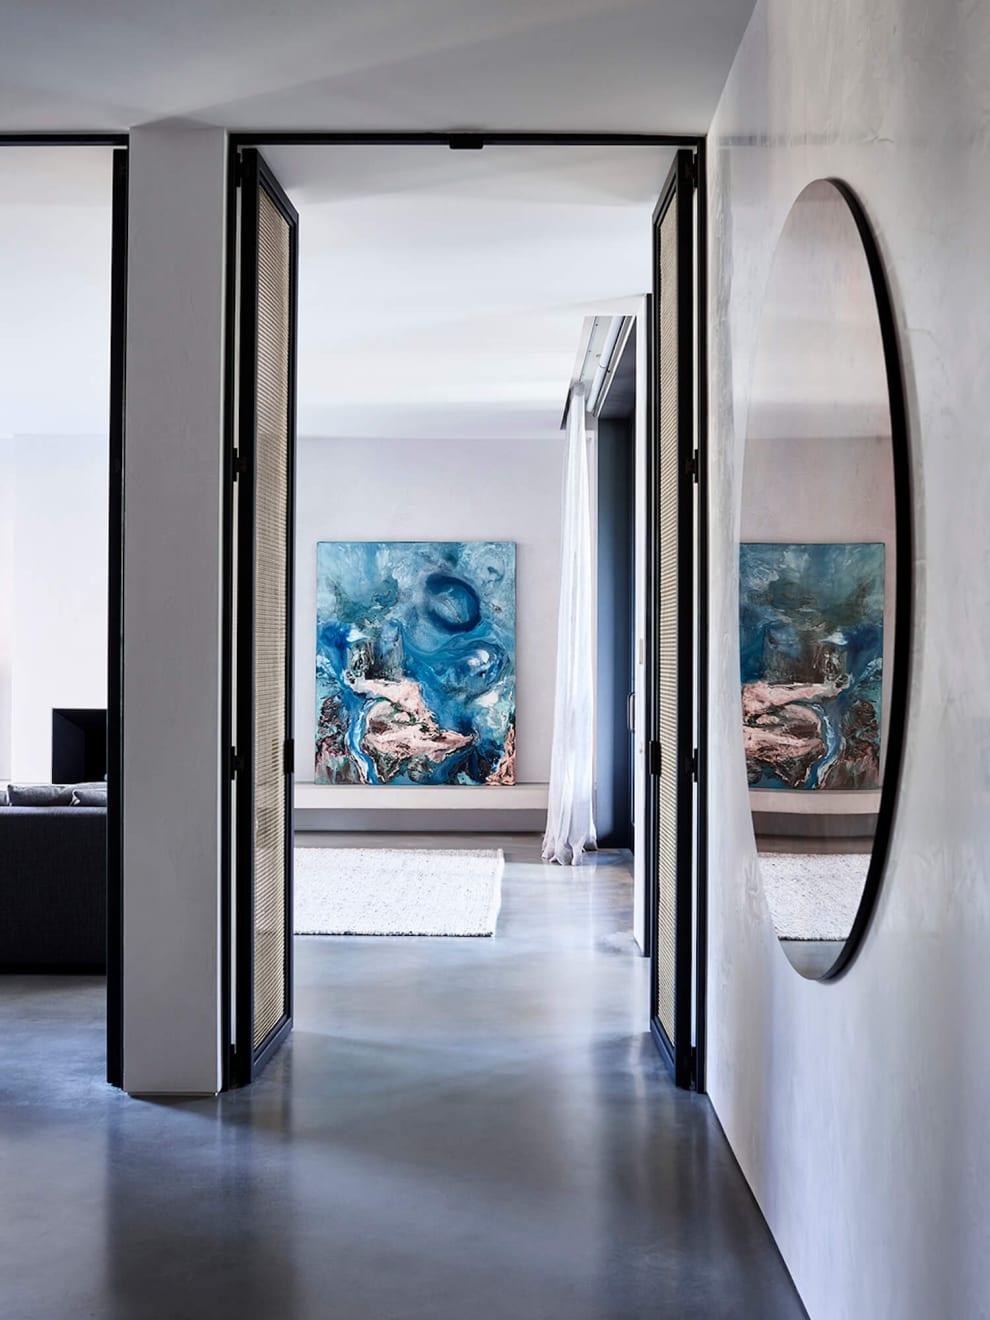 Eduardo Santos South Yarra Residence by Architect Rob Mills. Image courtesy of RMA.